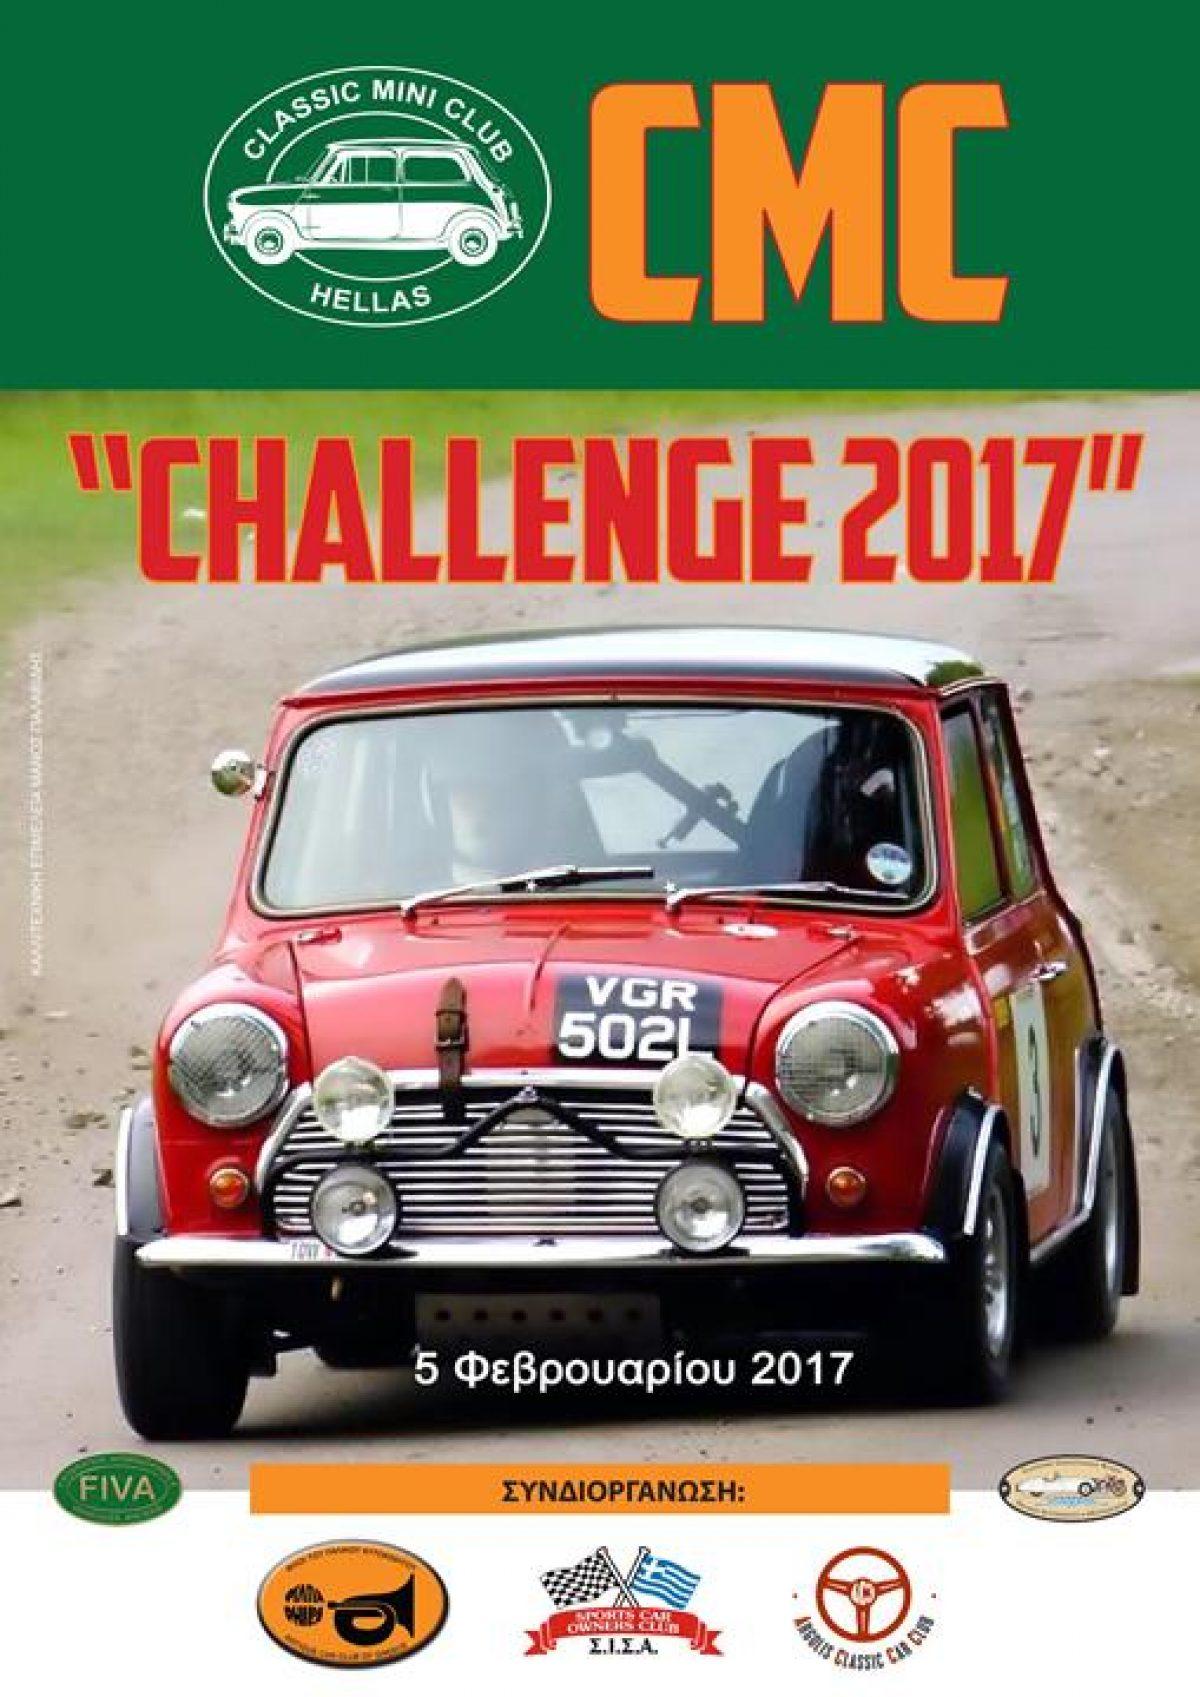 CMC CHALLENGE 2017